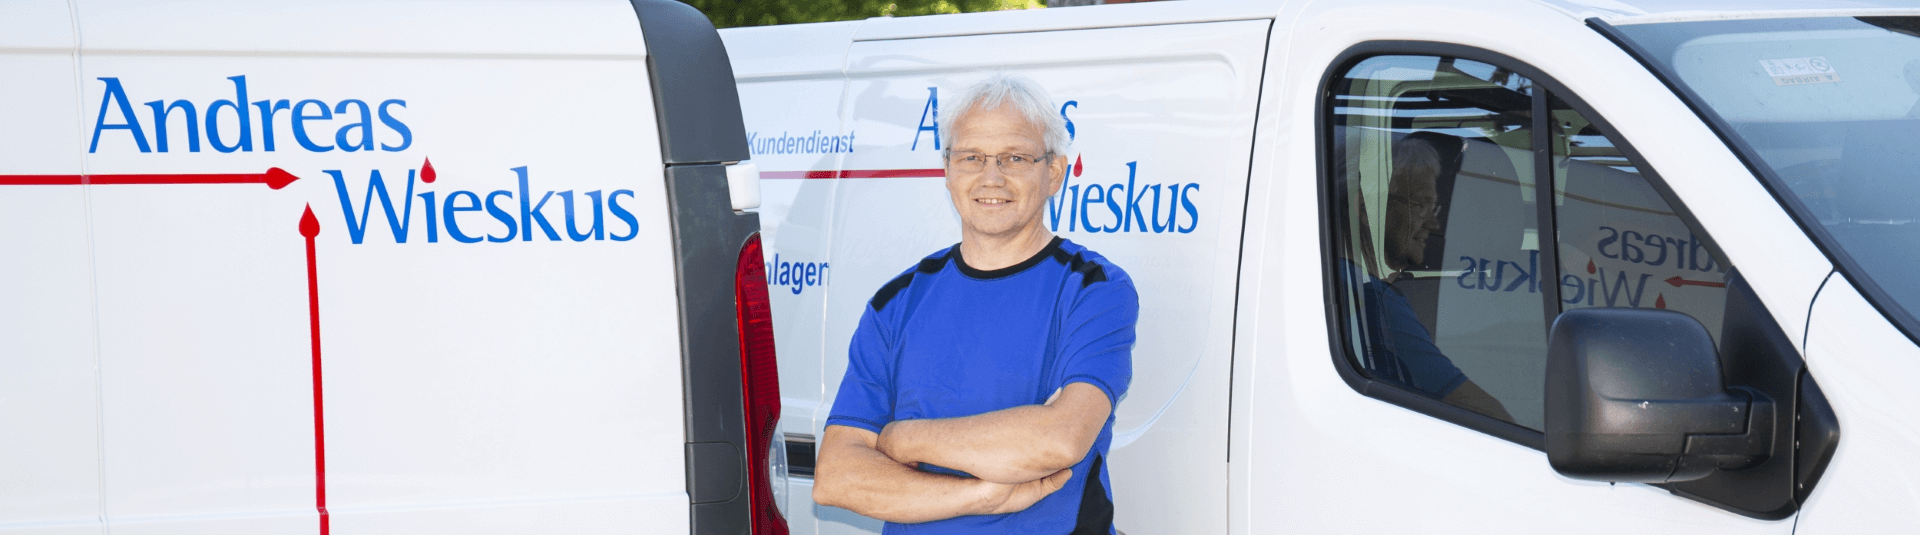 andreas-wieskus-duelmen-sanitaer-heizung-leistungen